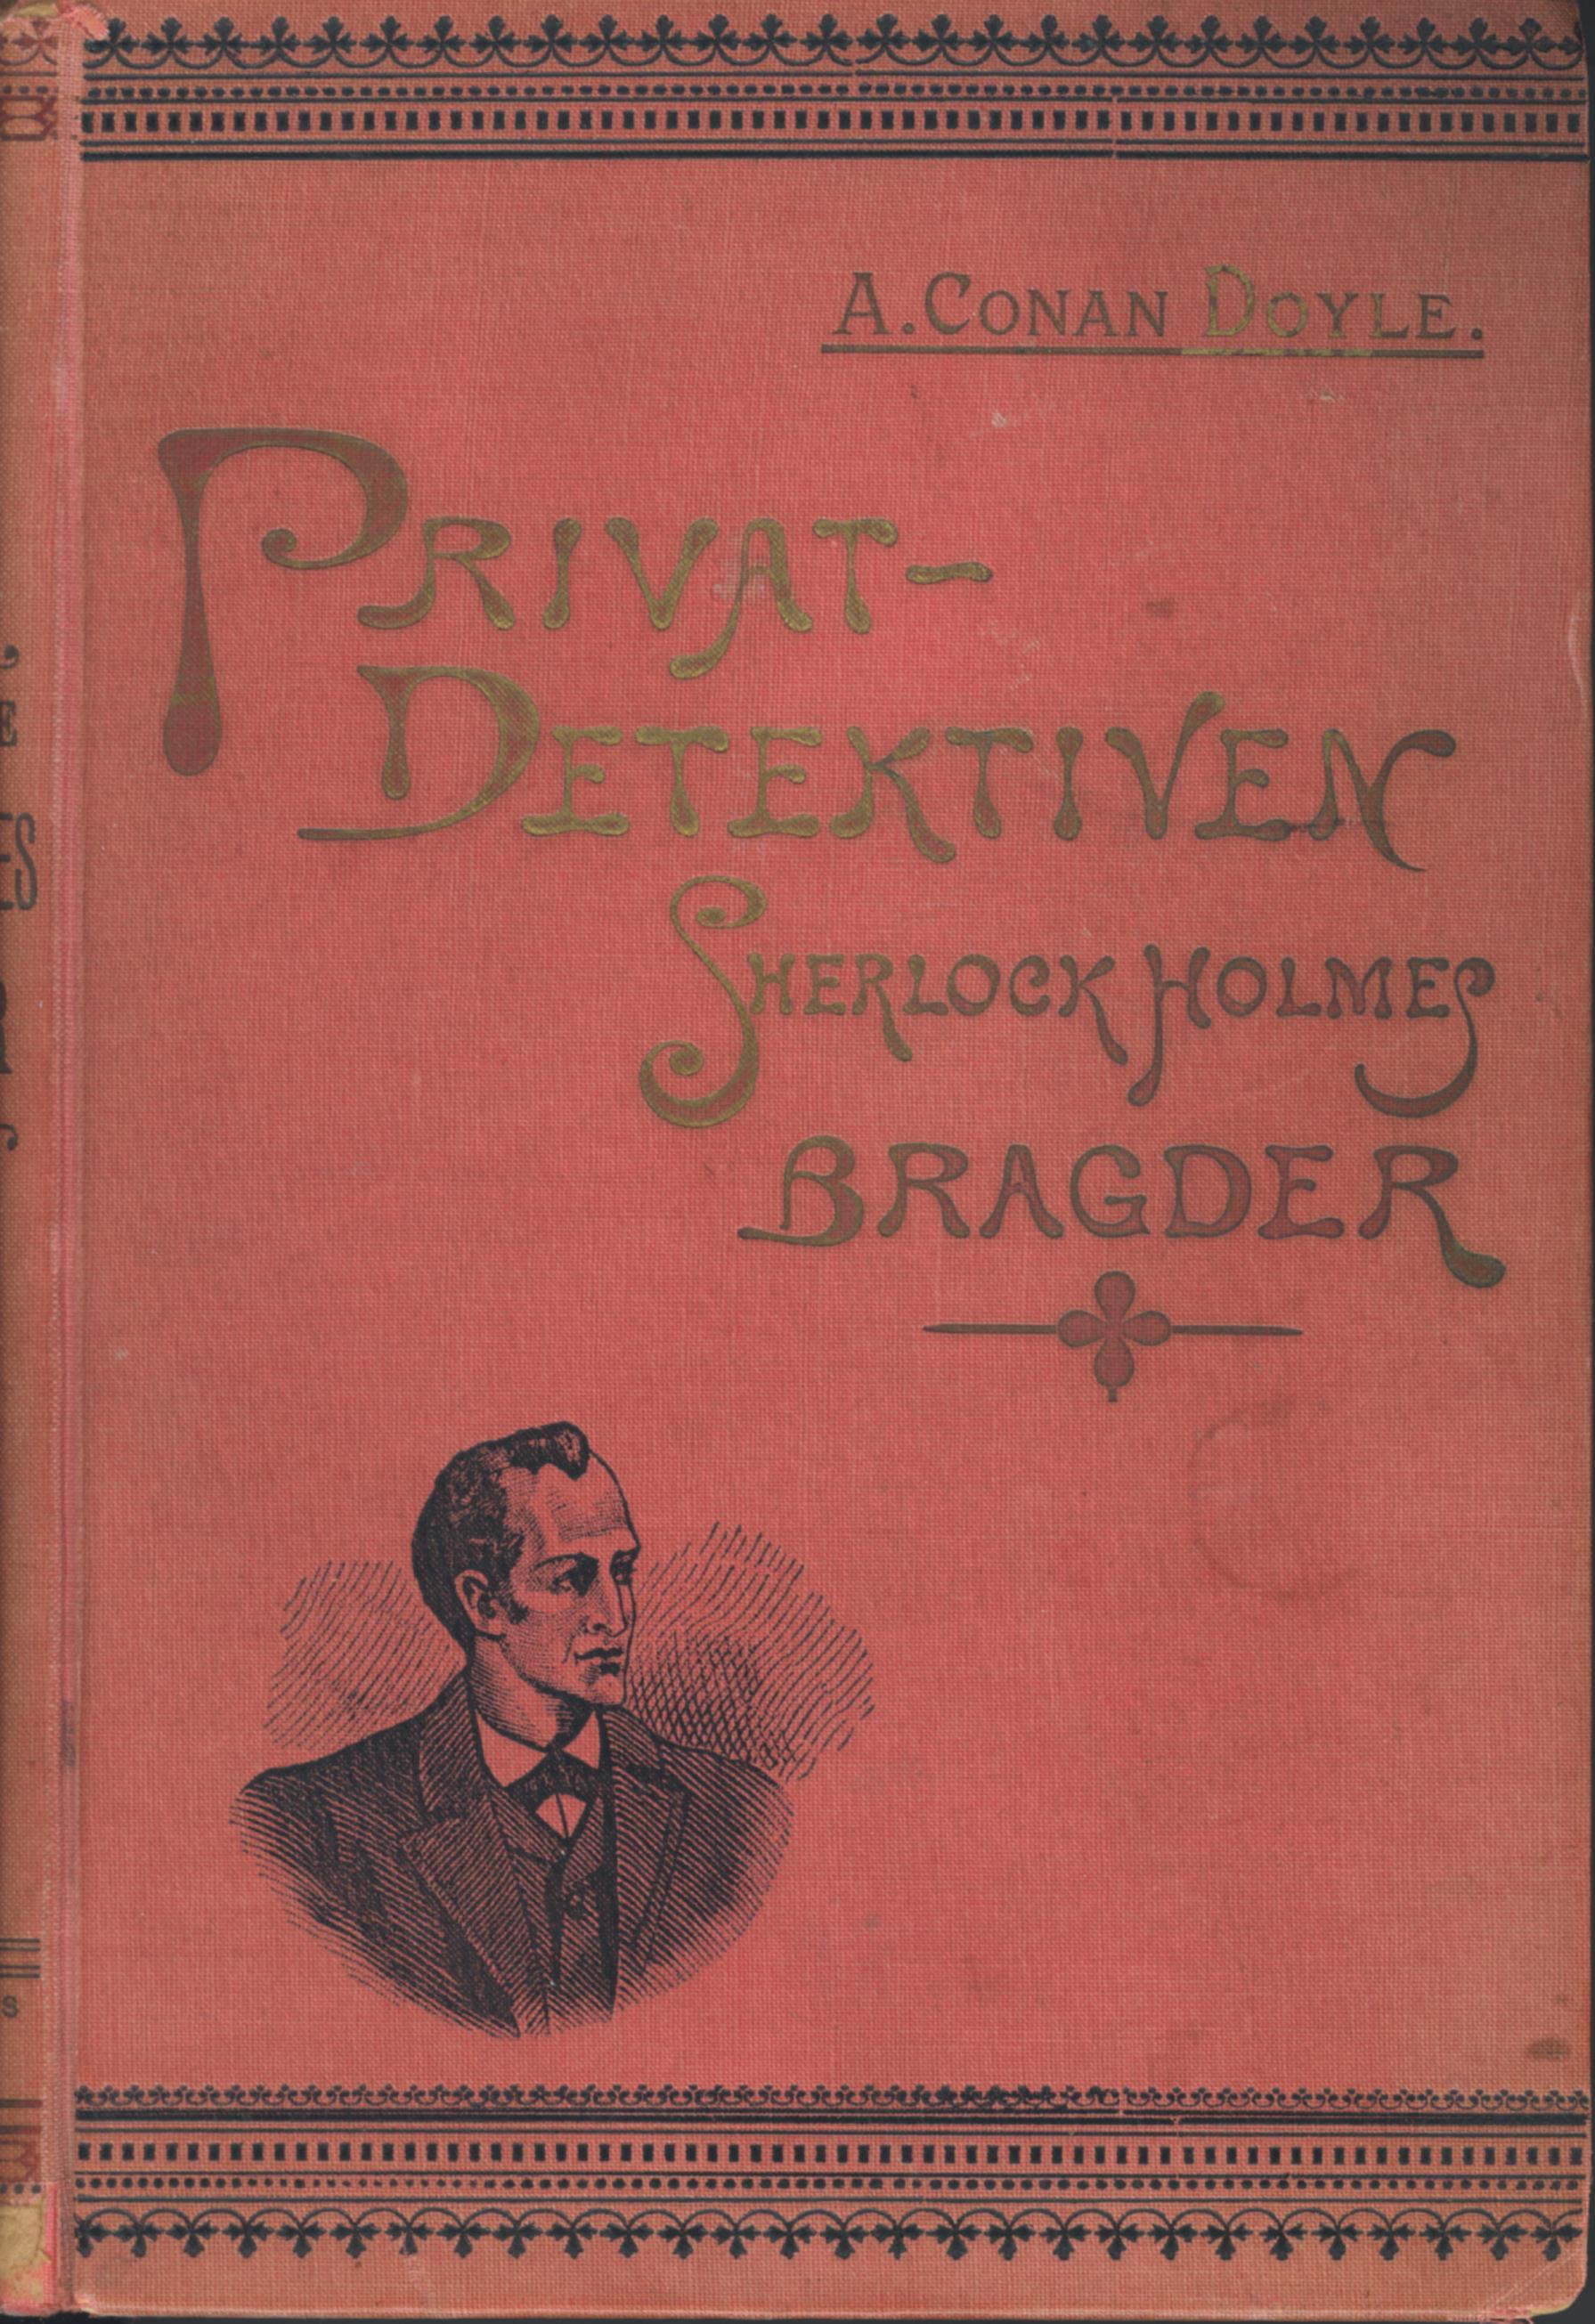 1899-1900-01x